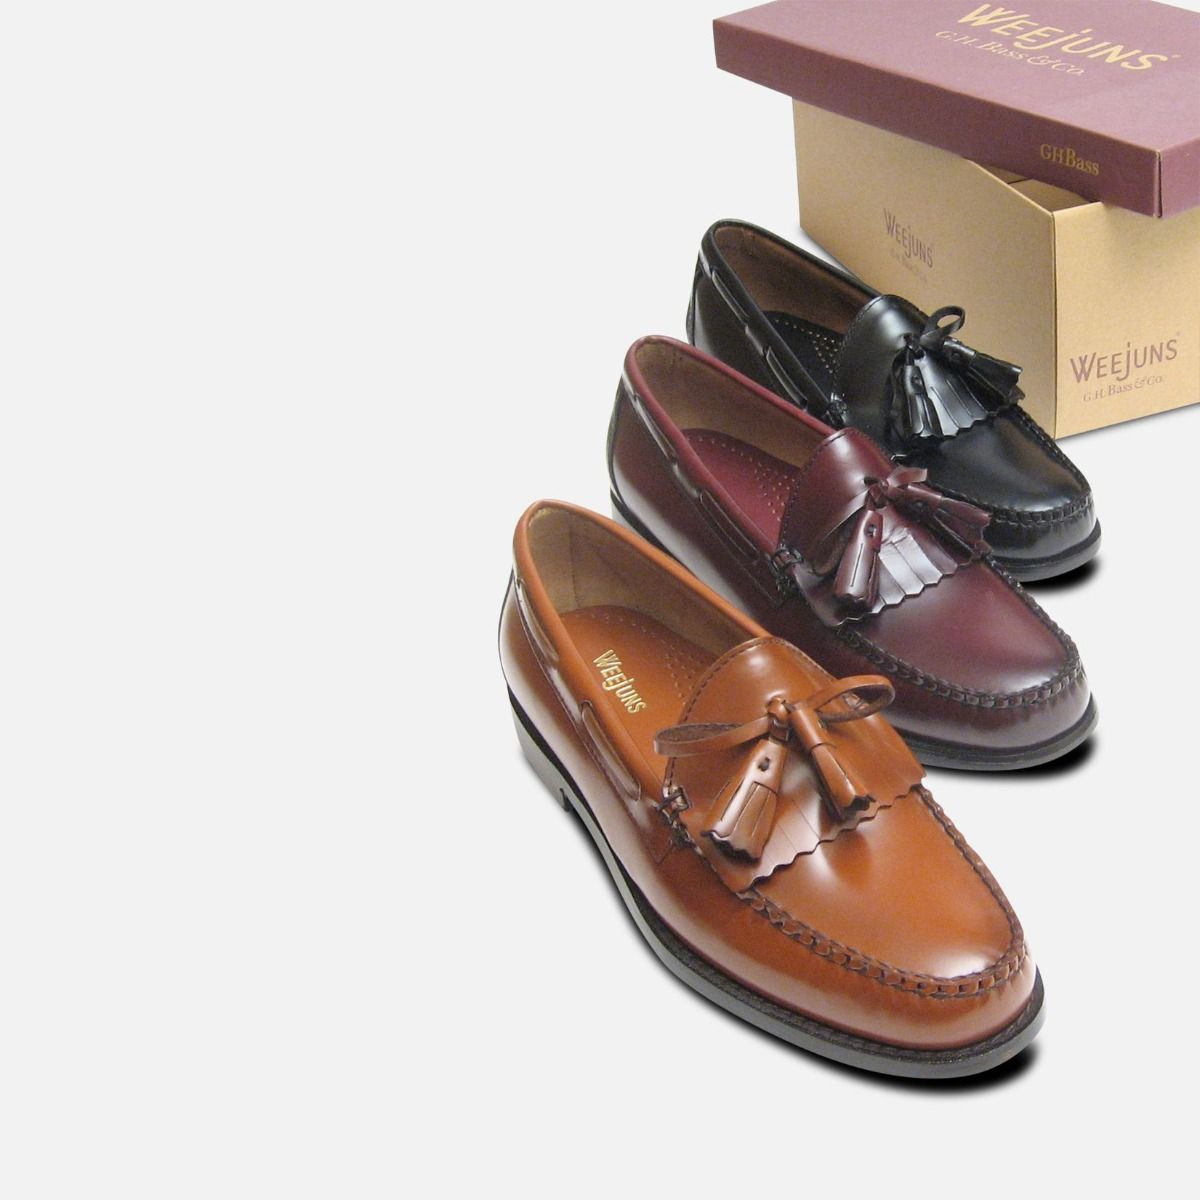 57f986b4696a6 Mens Black Polished Formal Fringe & Tassel Loafers by Bass Weejuns